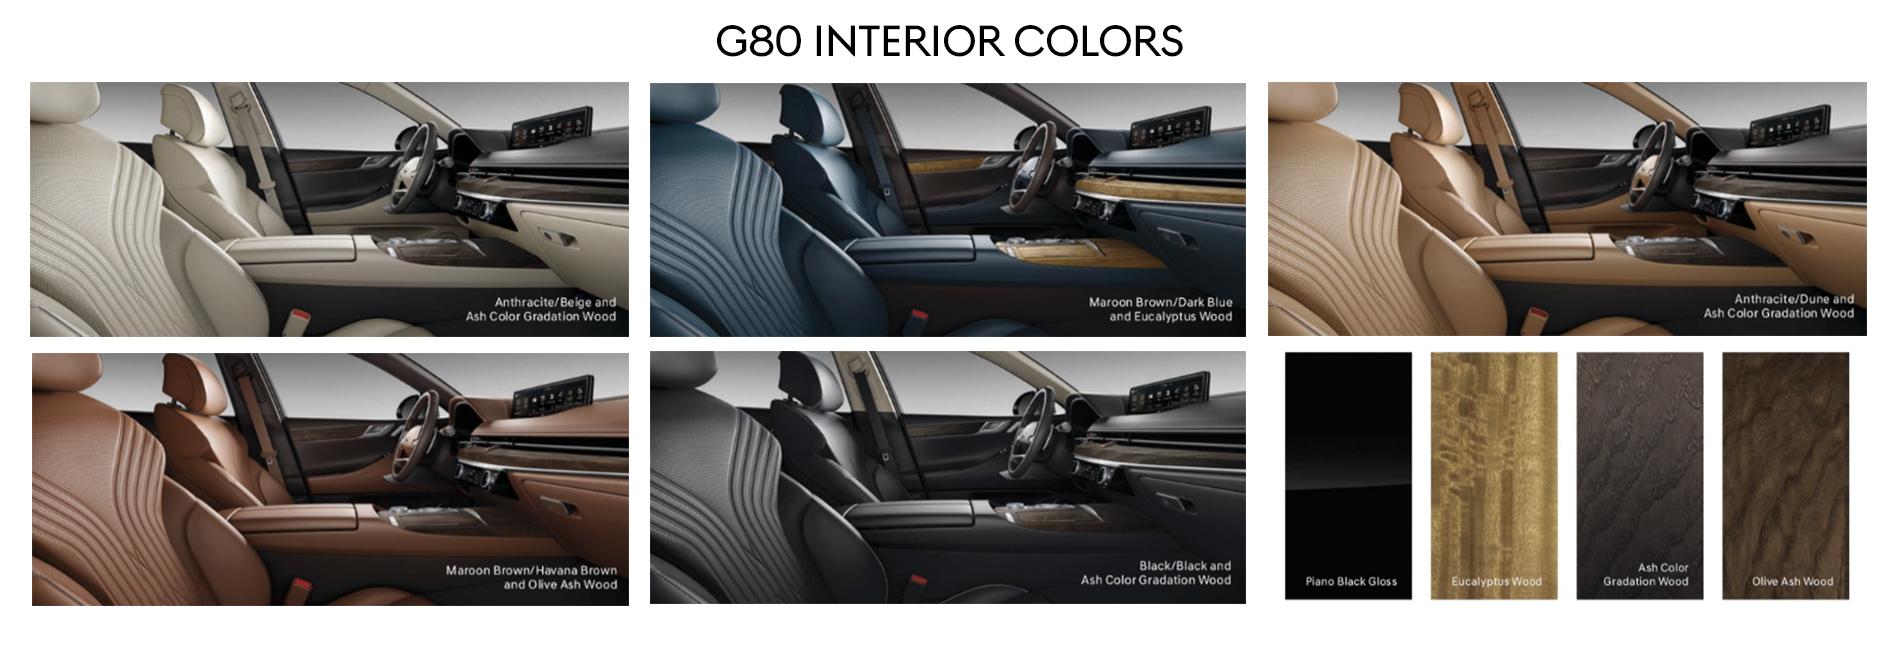 G80_INTERIOR